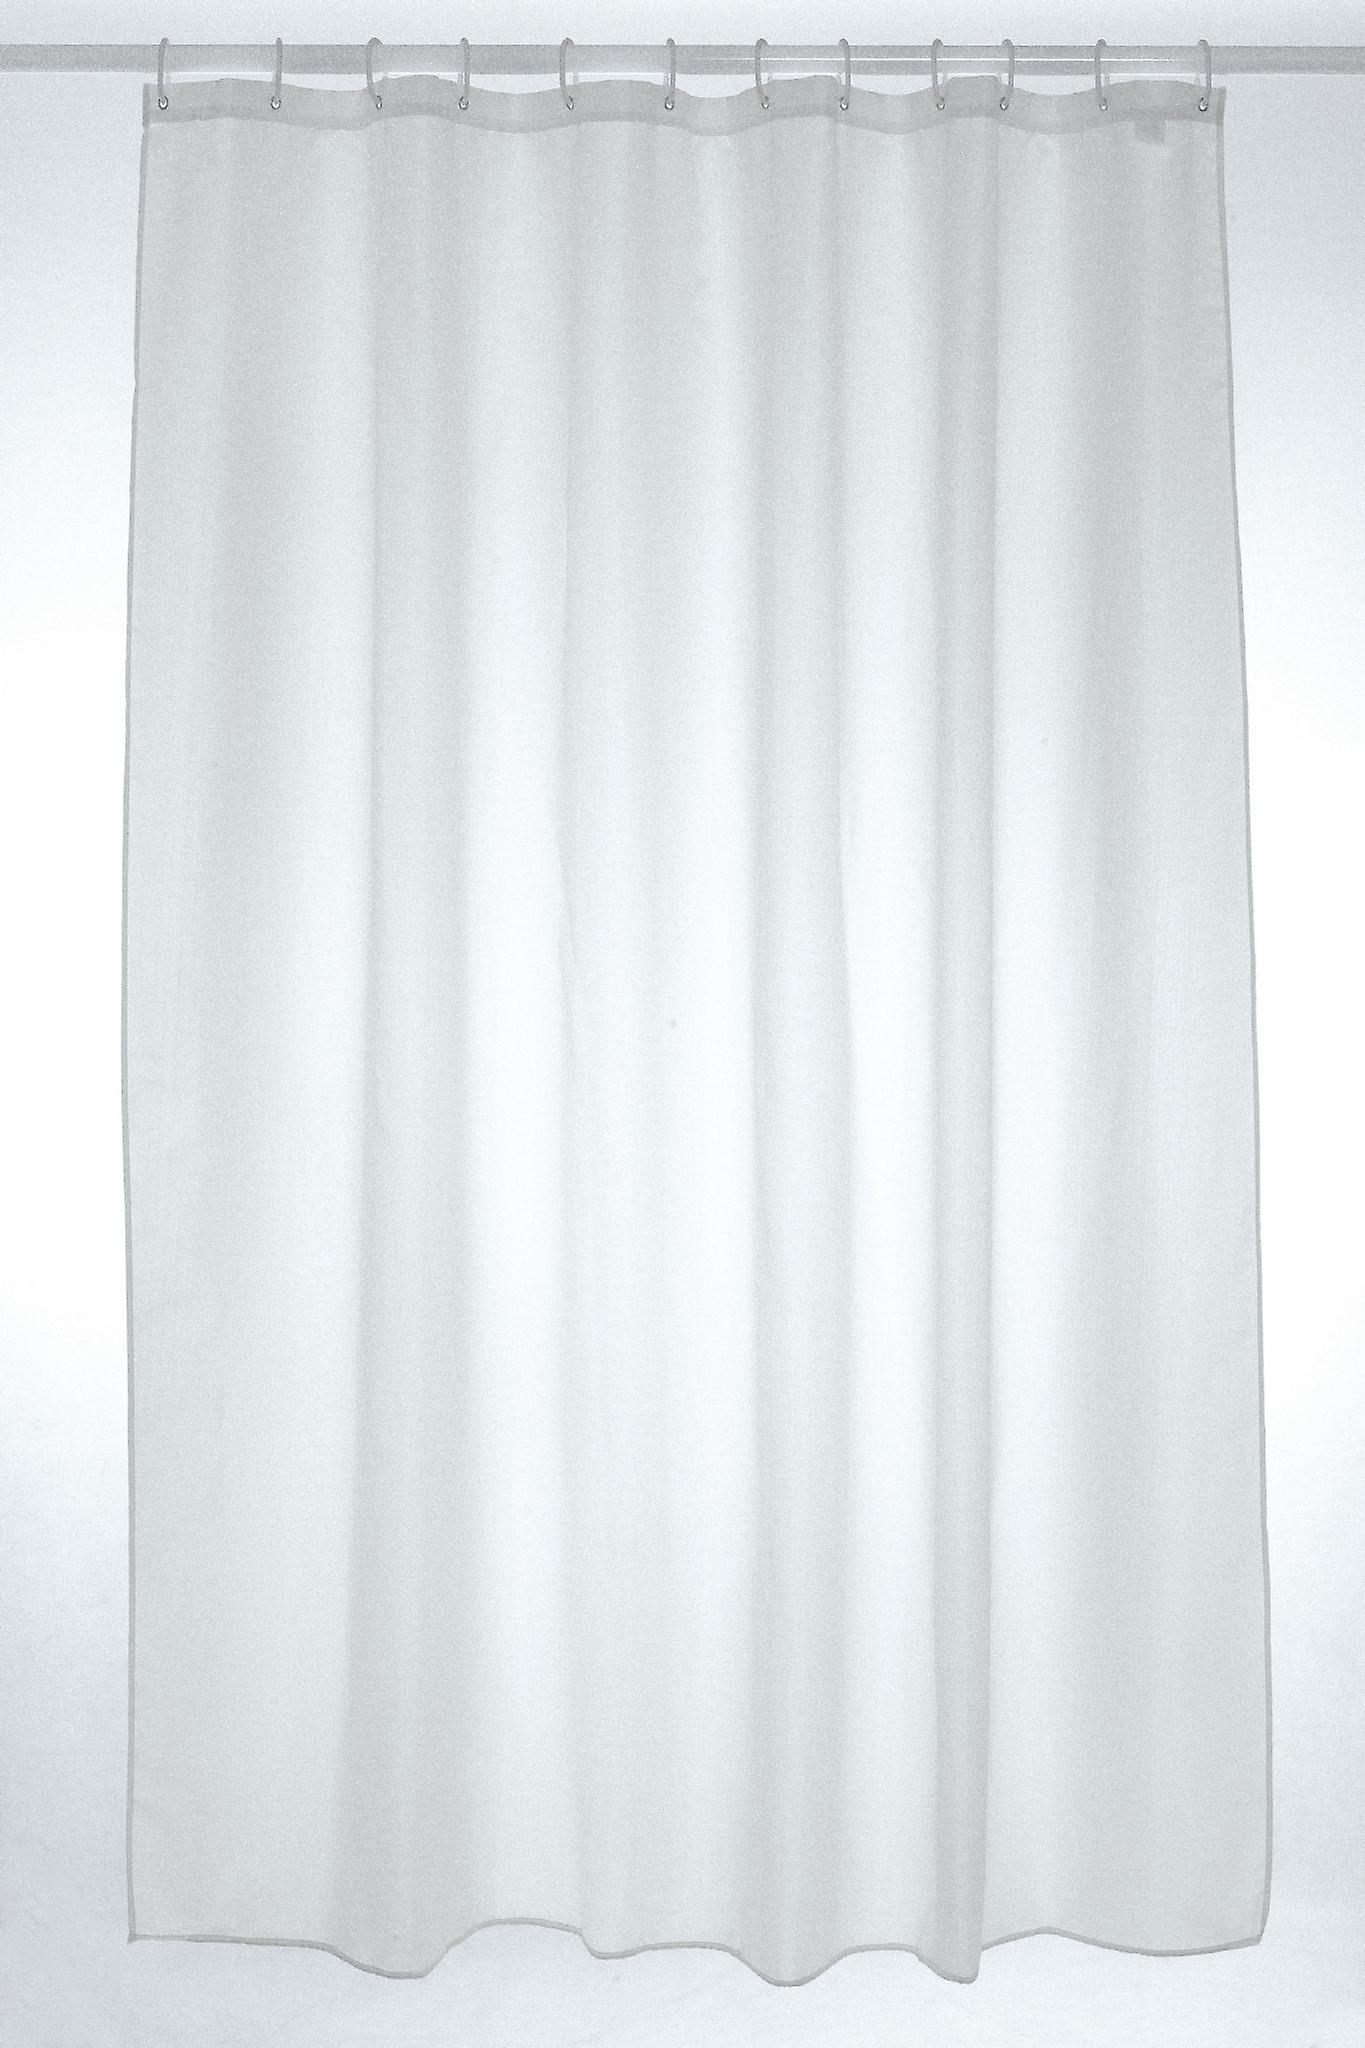 Witte platte Polyester douche gordijn 250 x 180cm